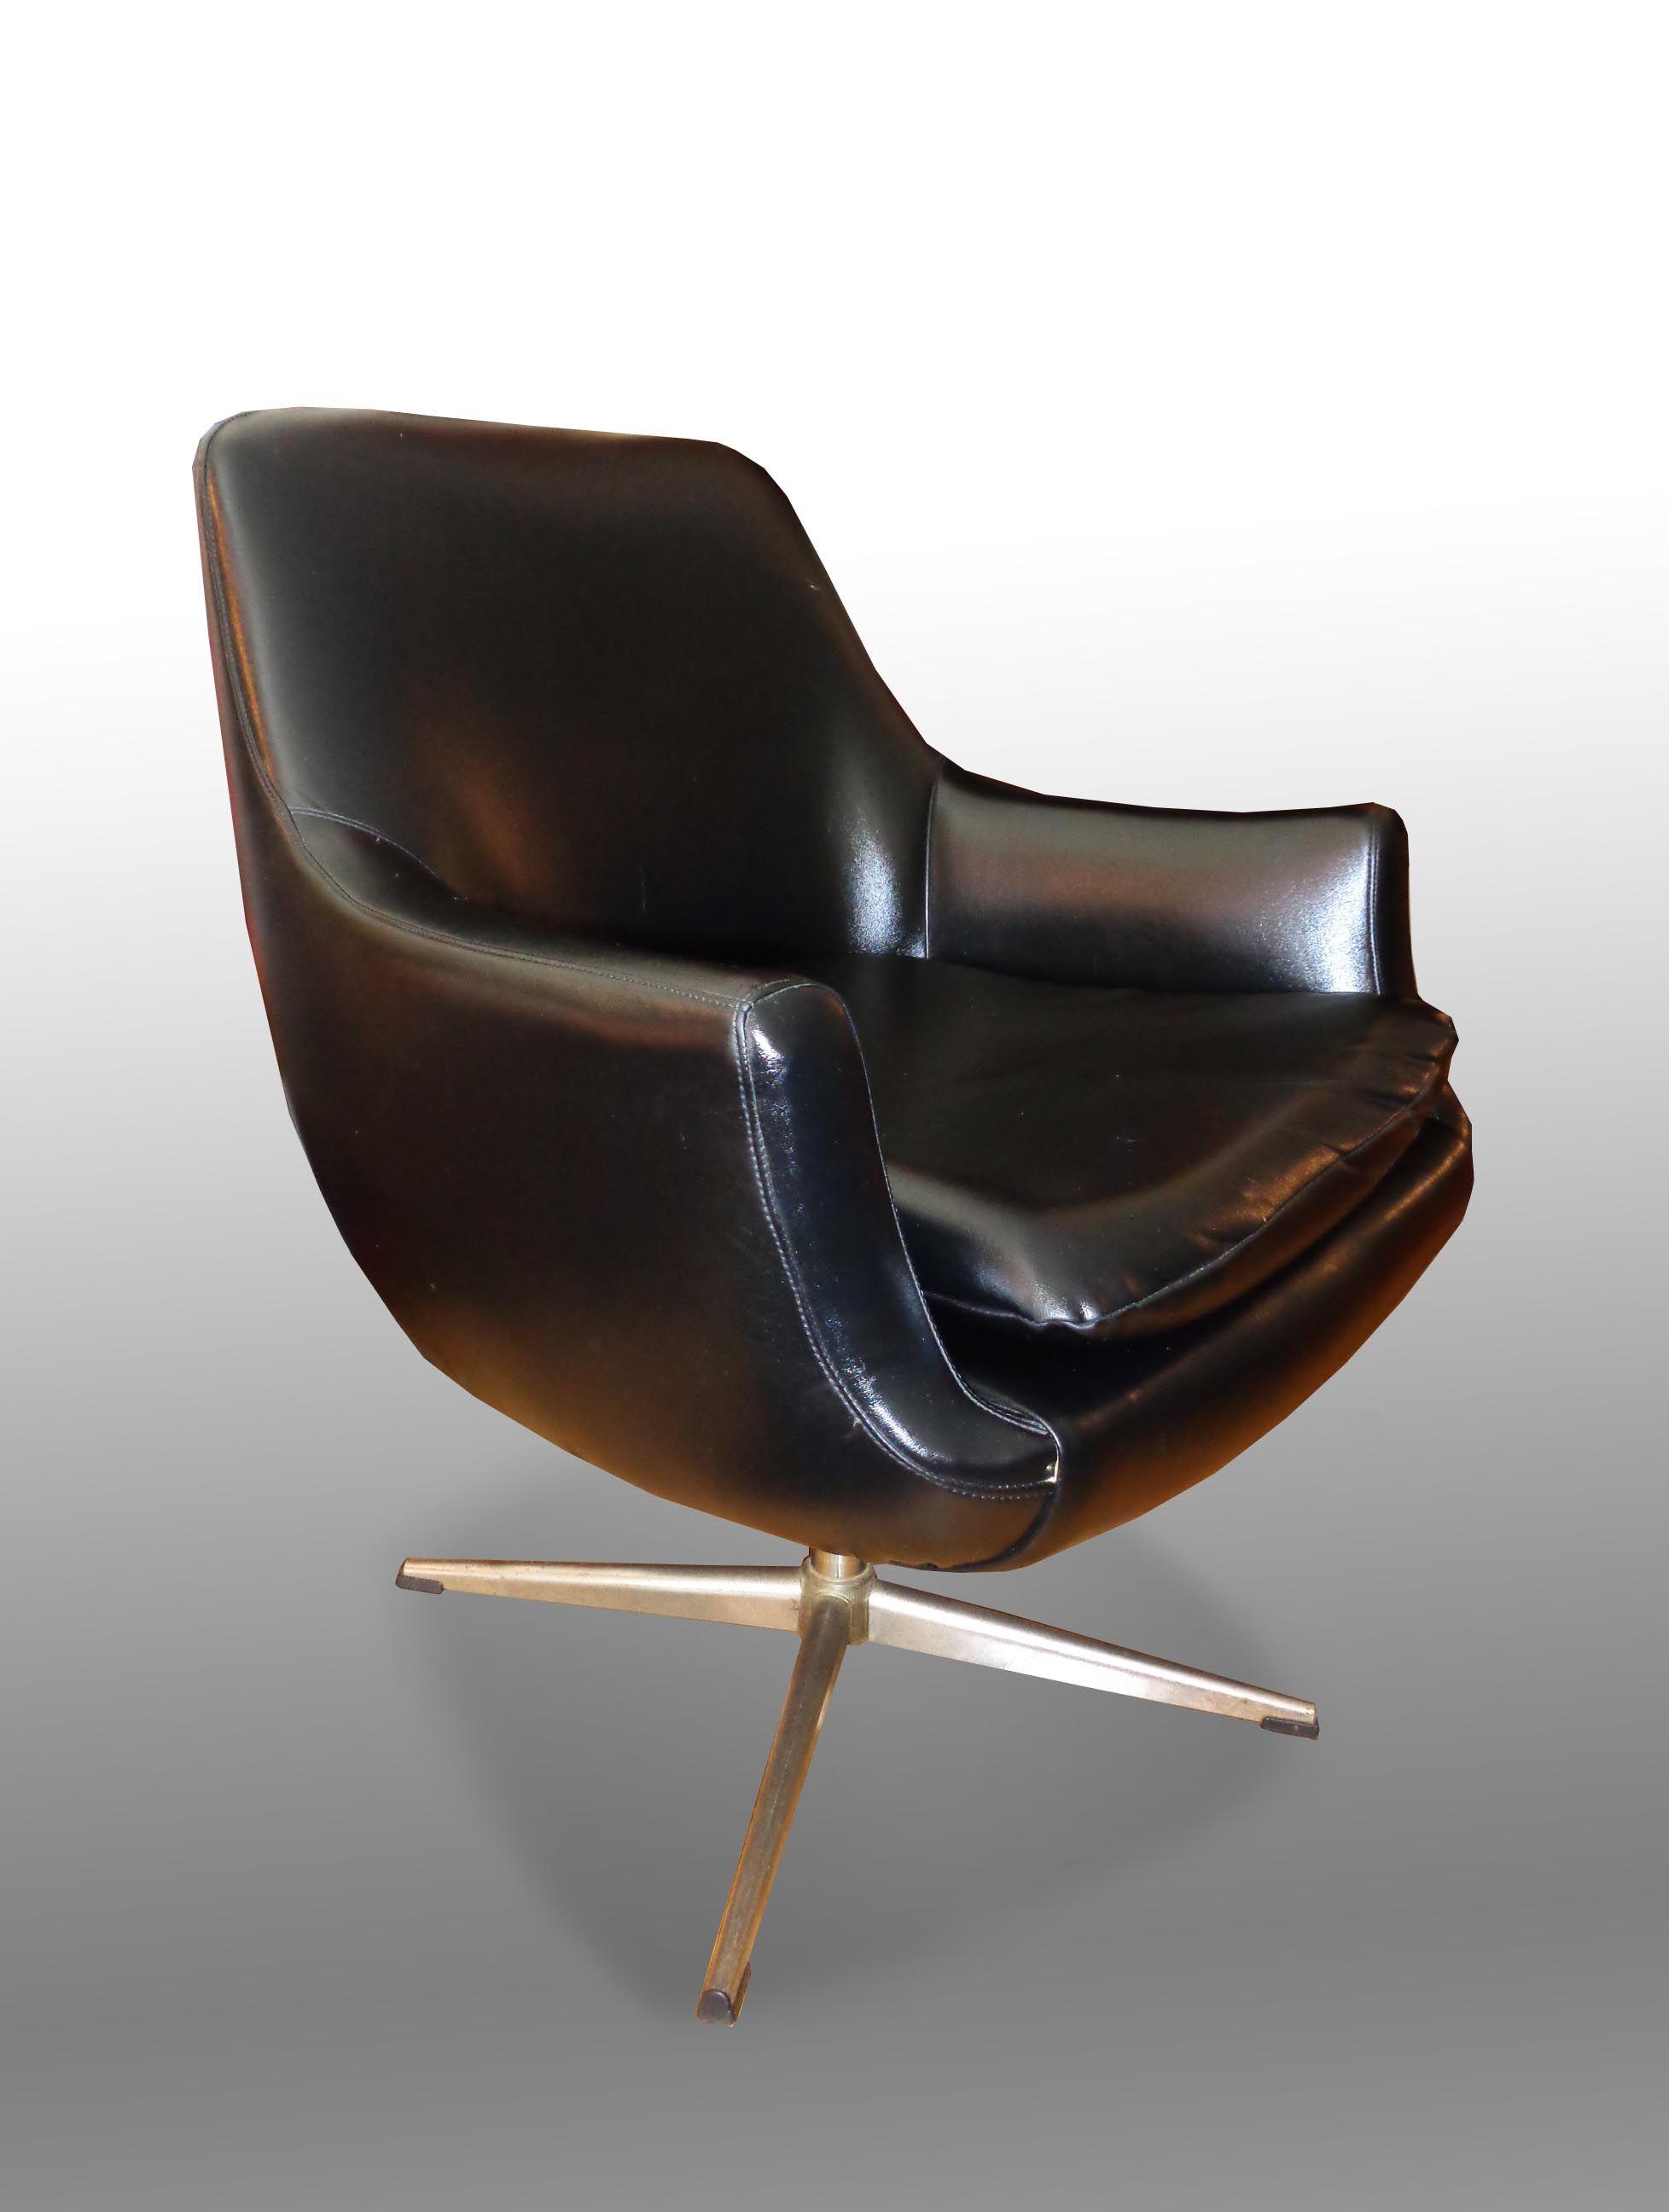 Mid Century Modern Overman A/B Swedish Black Pod Lounge Chair (sold)